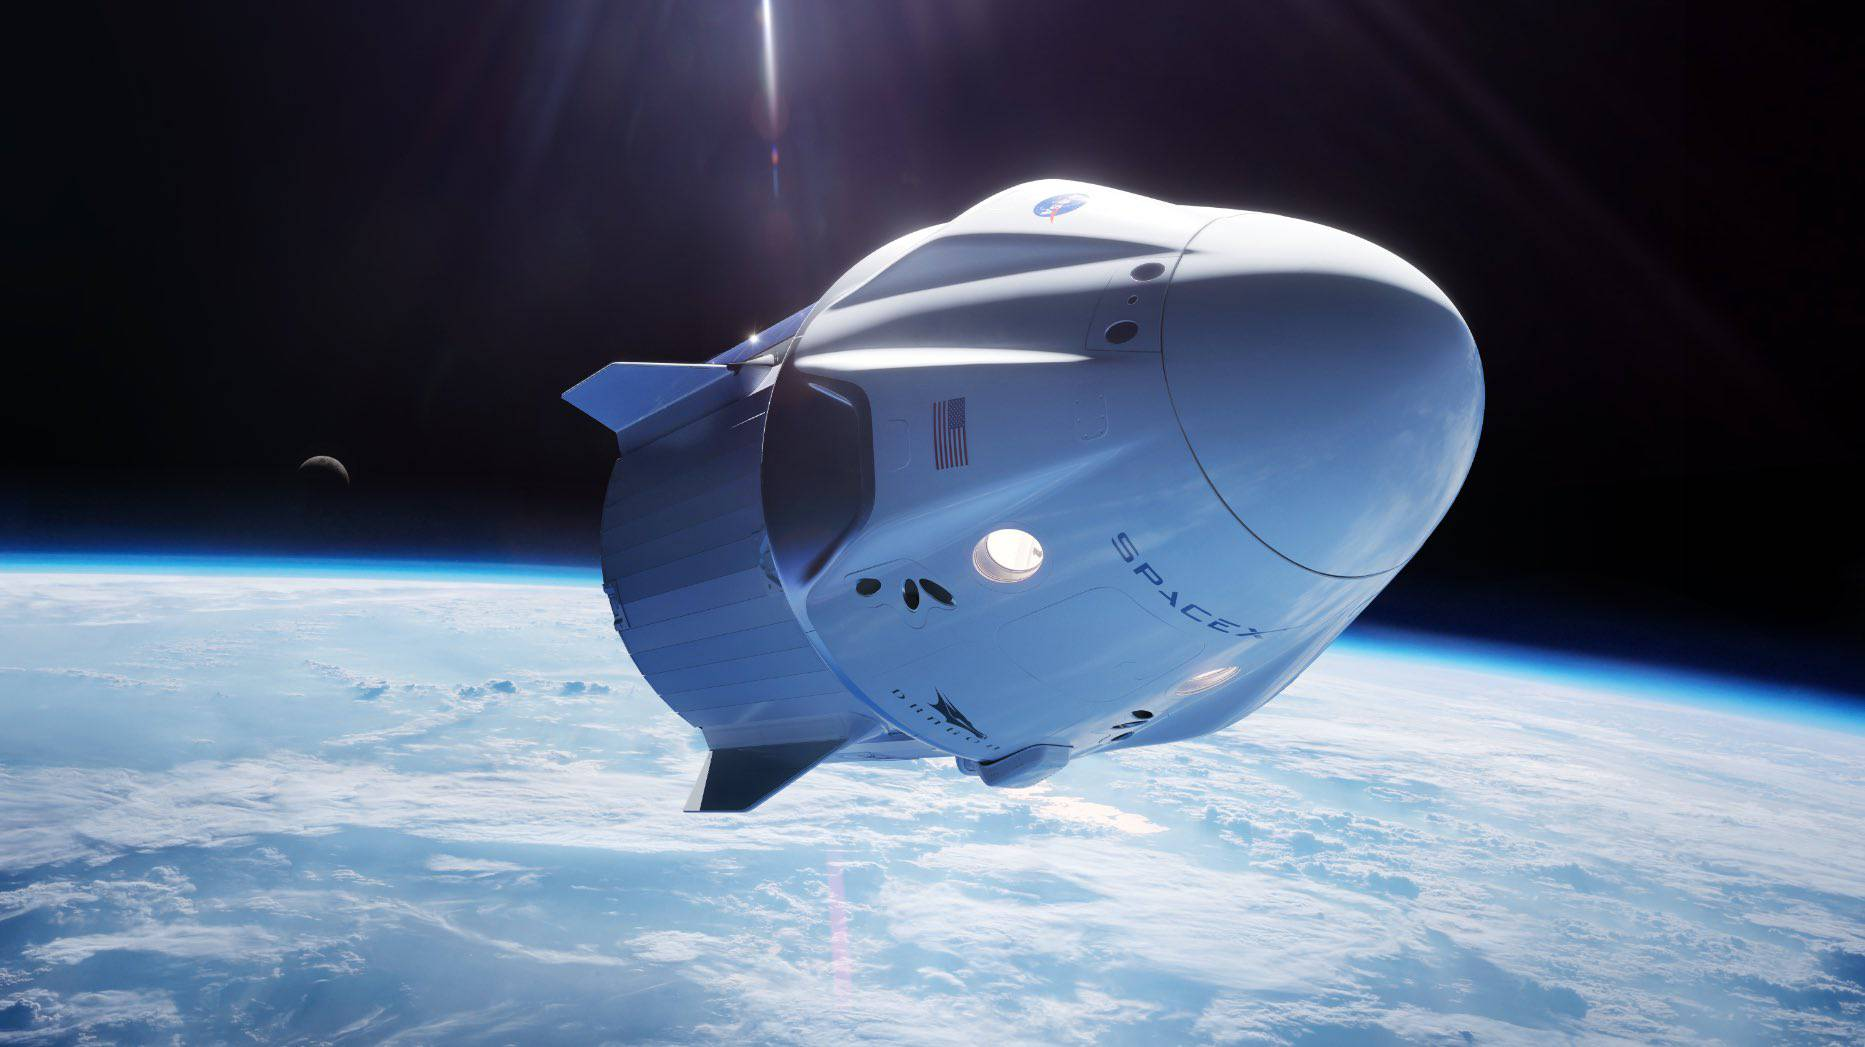 Uskoro će prevoziti astronaute: Crew Dragon pristao je na ISS